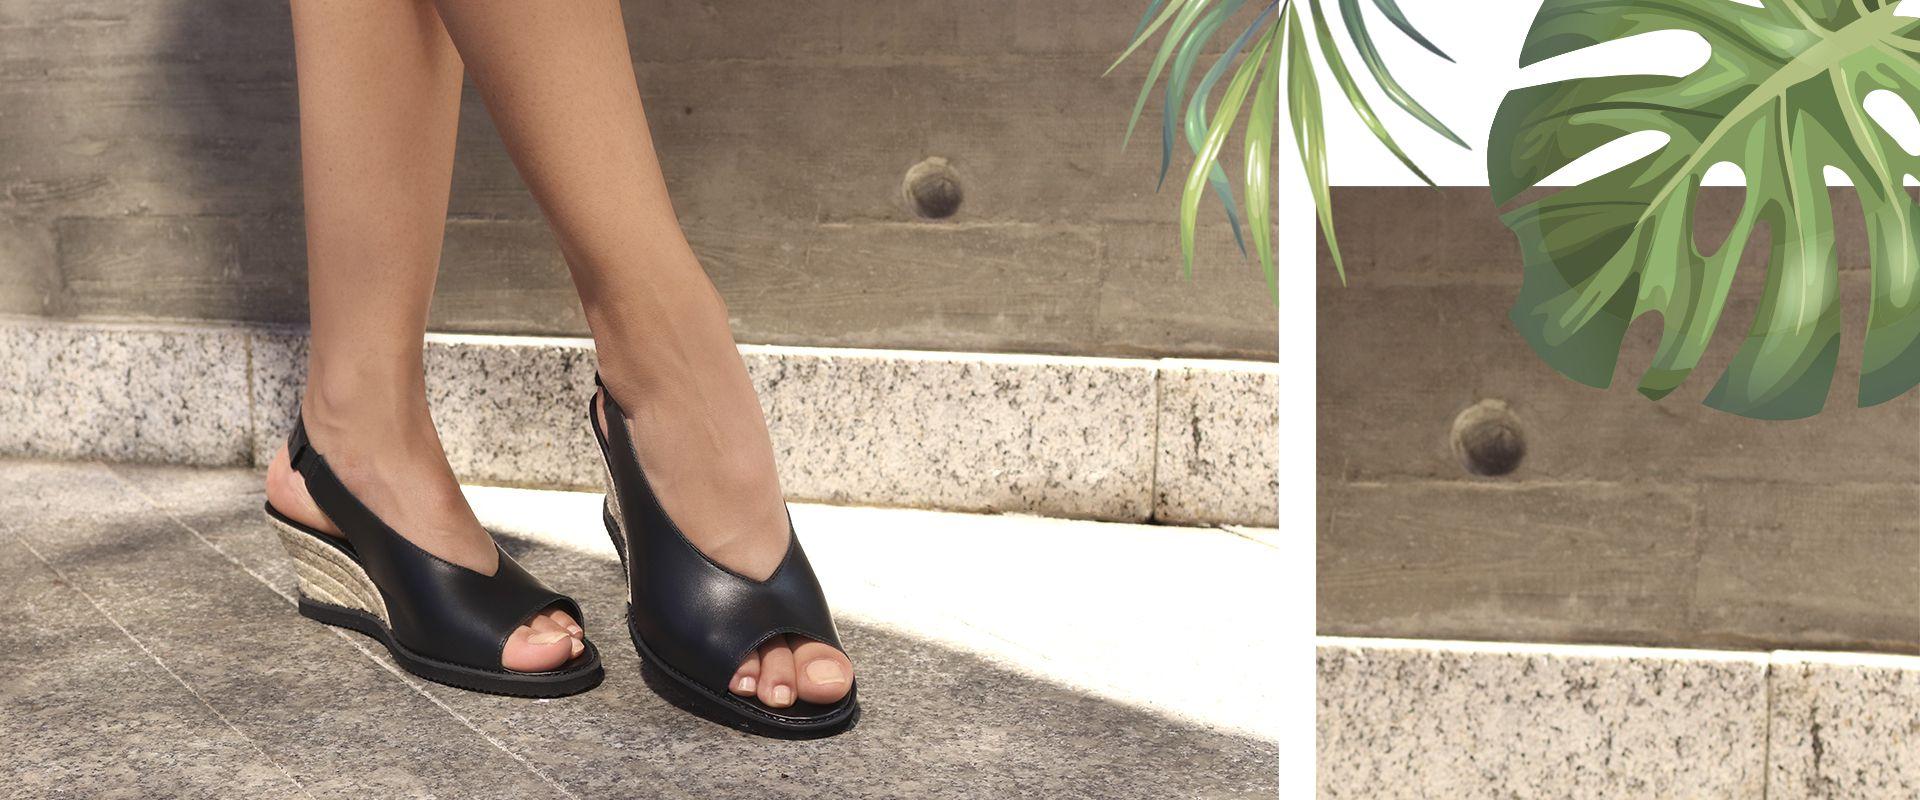 f429069f3 www.wishin.com.br - Wishin´ - Sapatos femininos | receitas maravilha ...